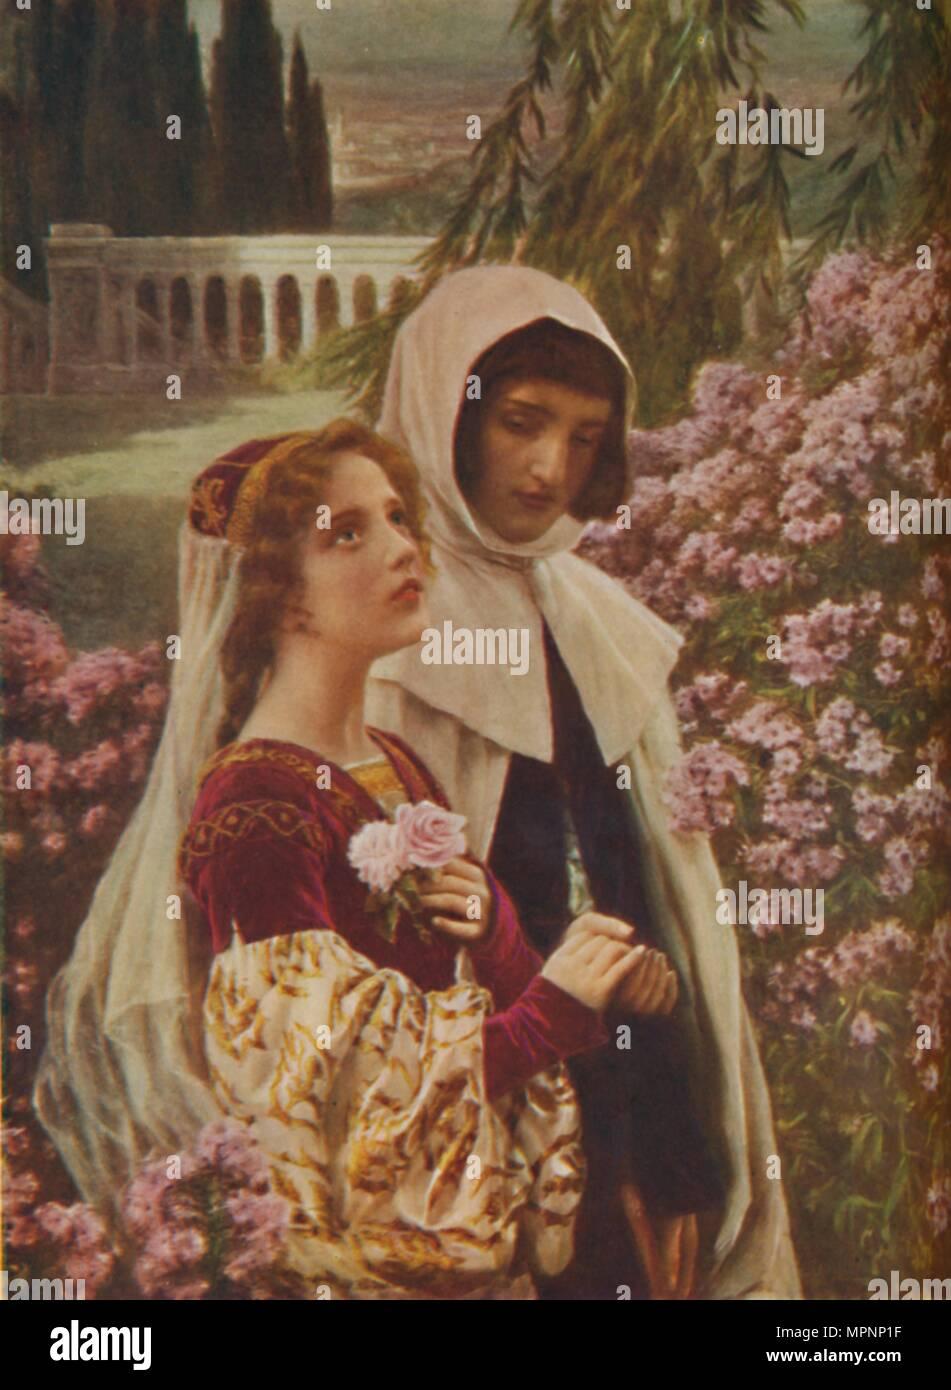 'Dante Aligheri - Dante and Beatrice in the Garden', c1925. Artist: Cesar Saccagi. - Stock Image